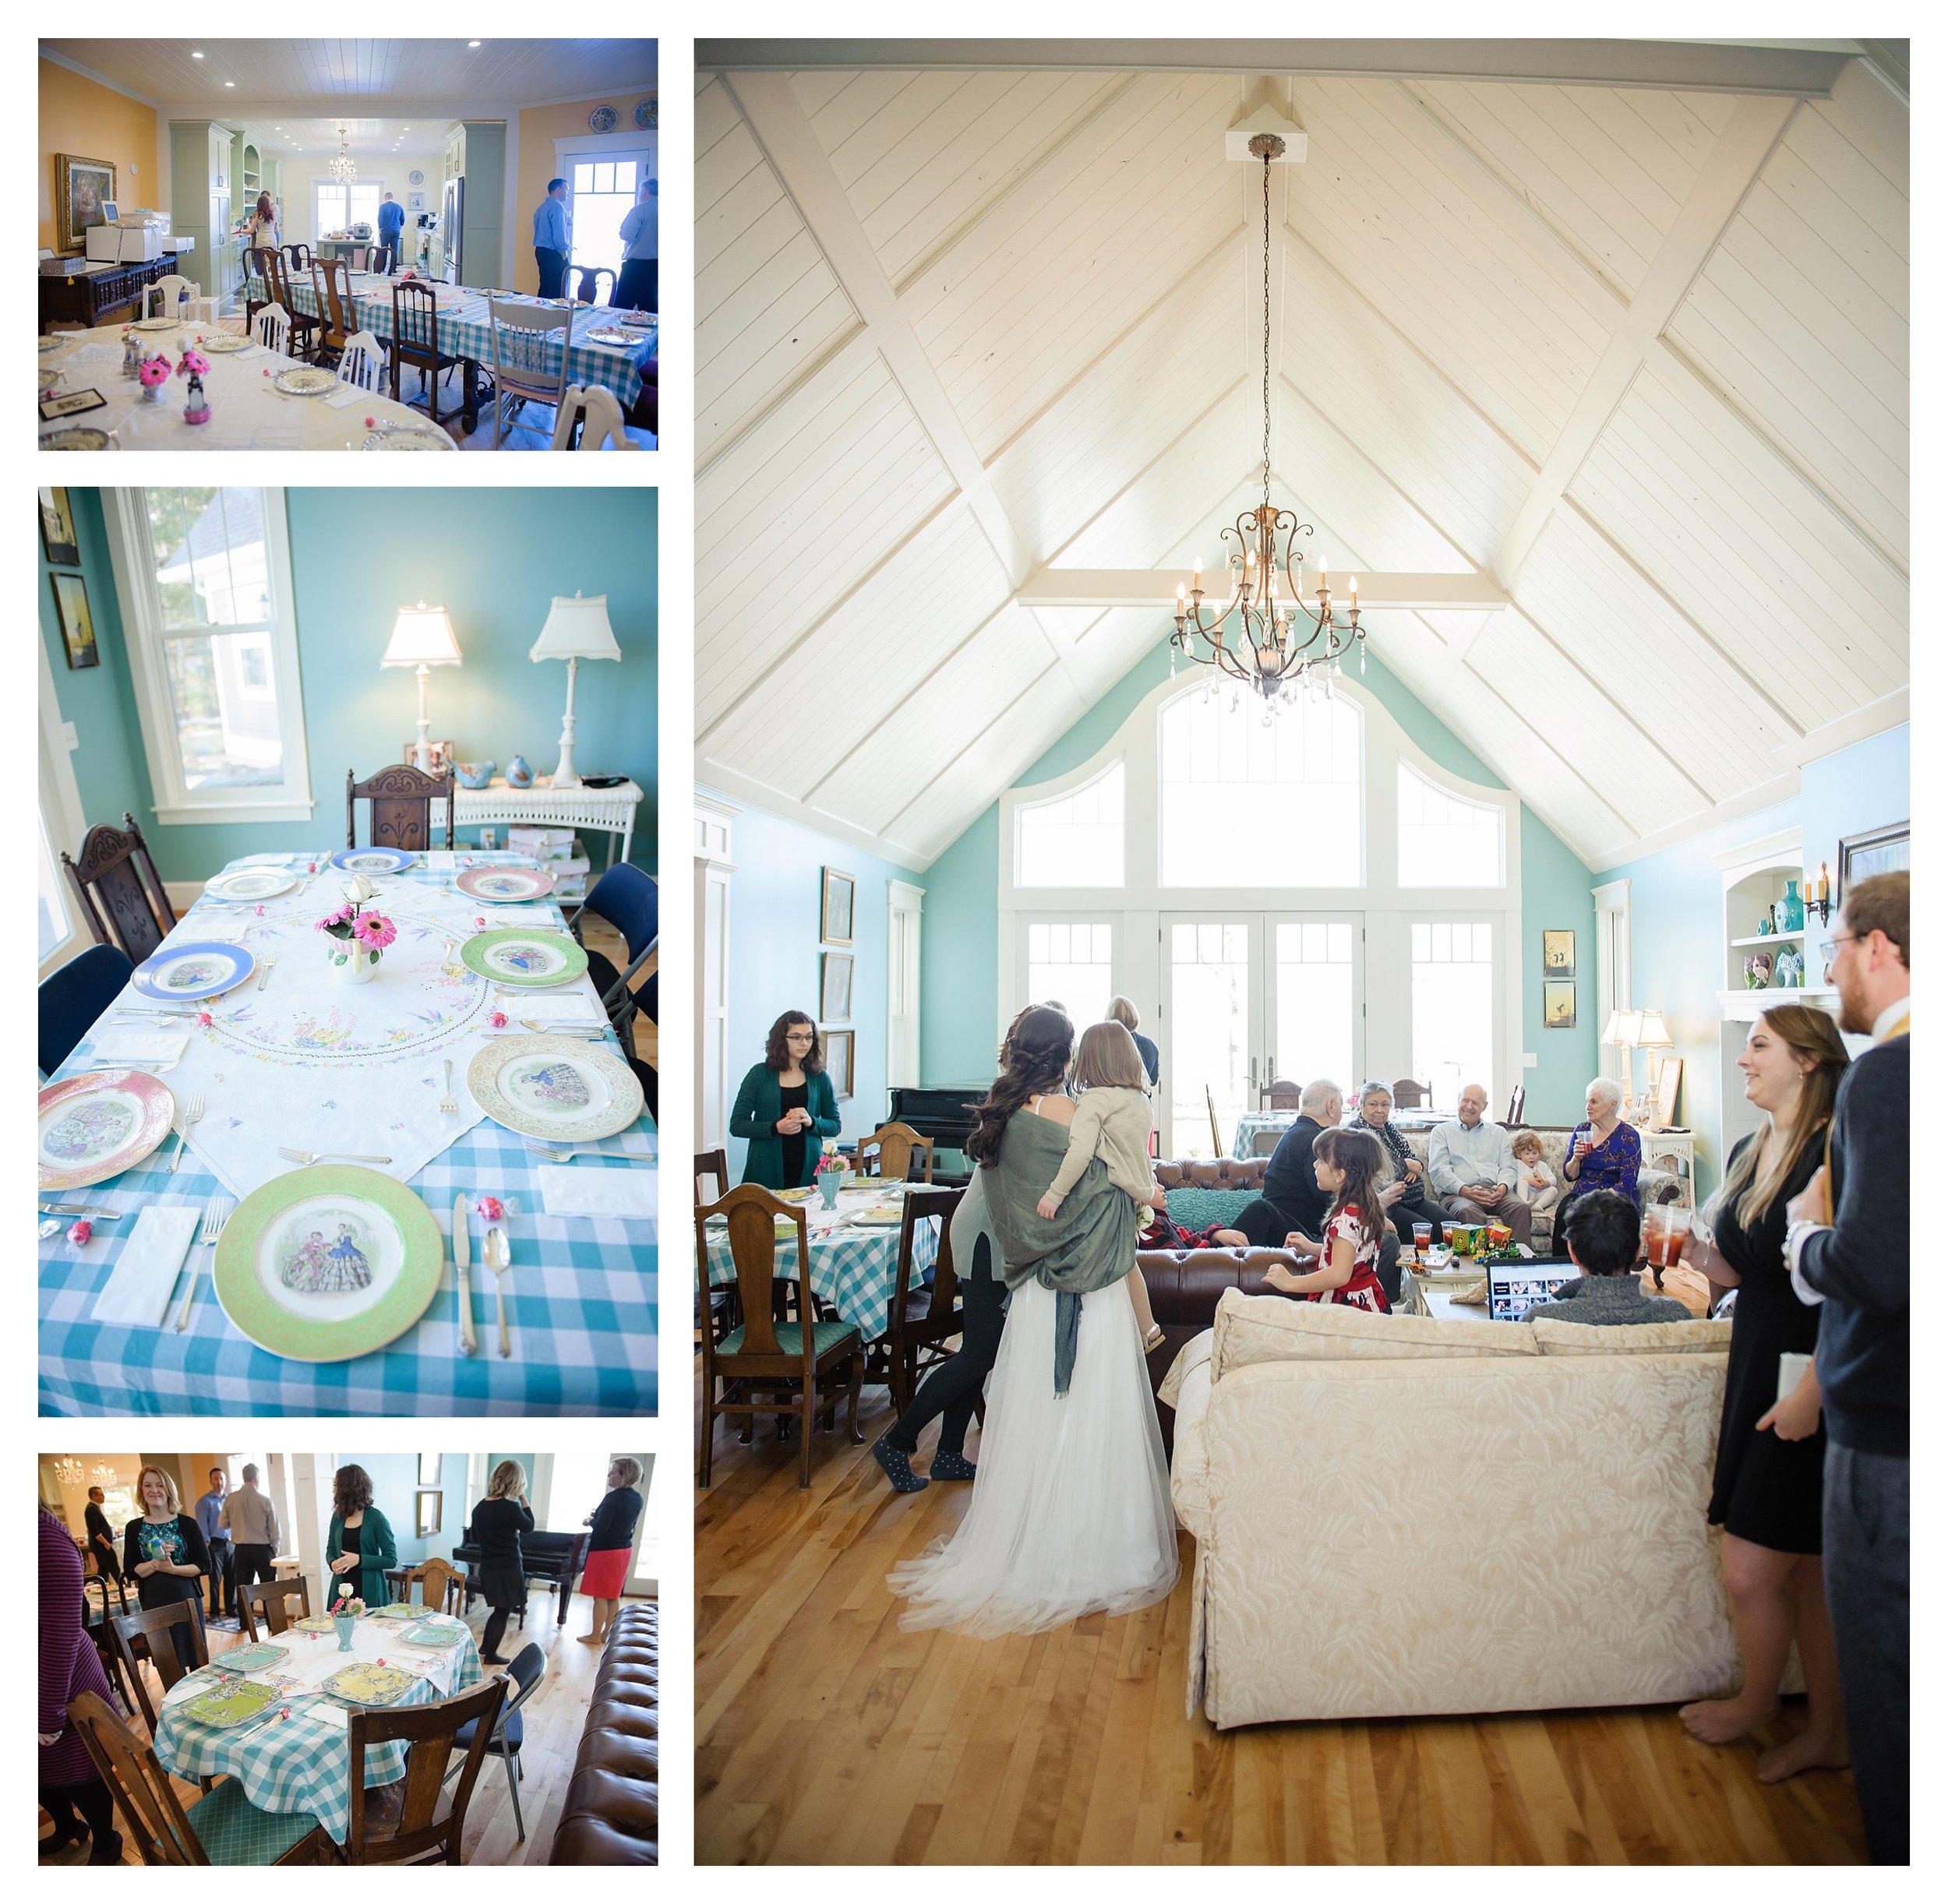 wisconsin wedding photographer timber baron inn bayfield wi ps 139 photography jen jensen_0219.jpg